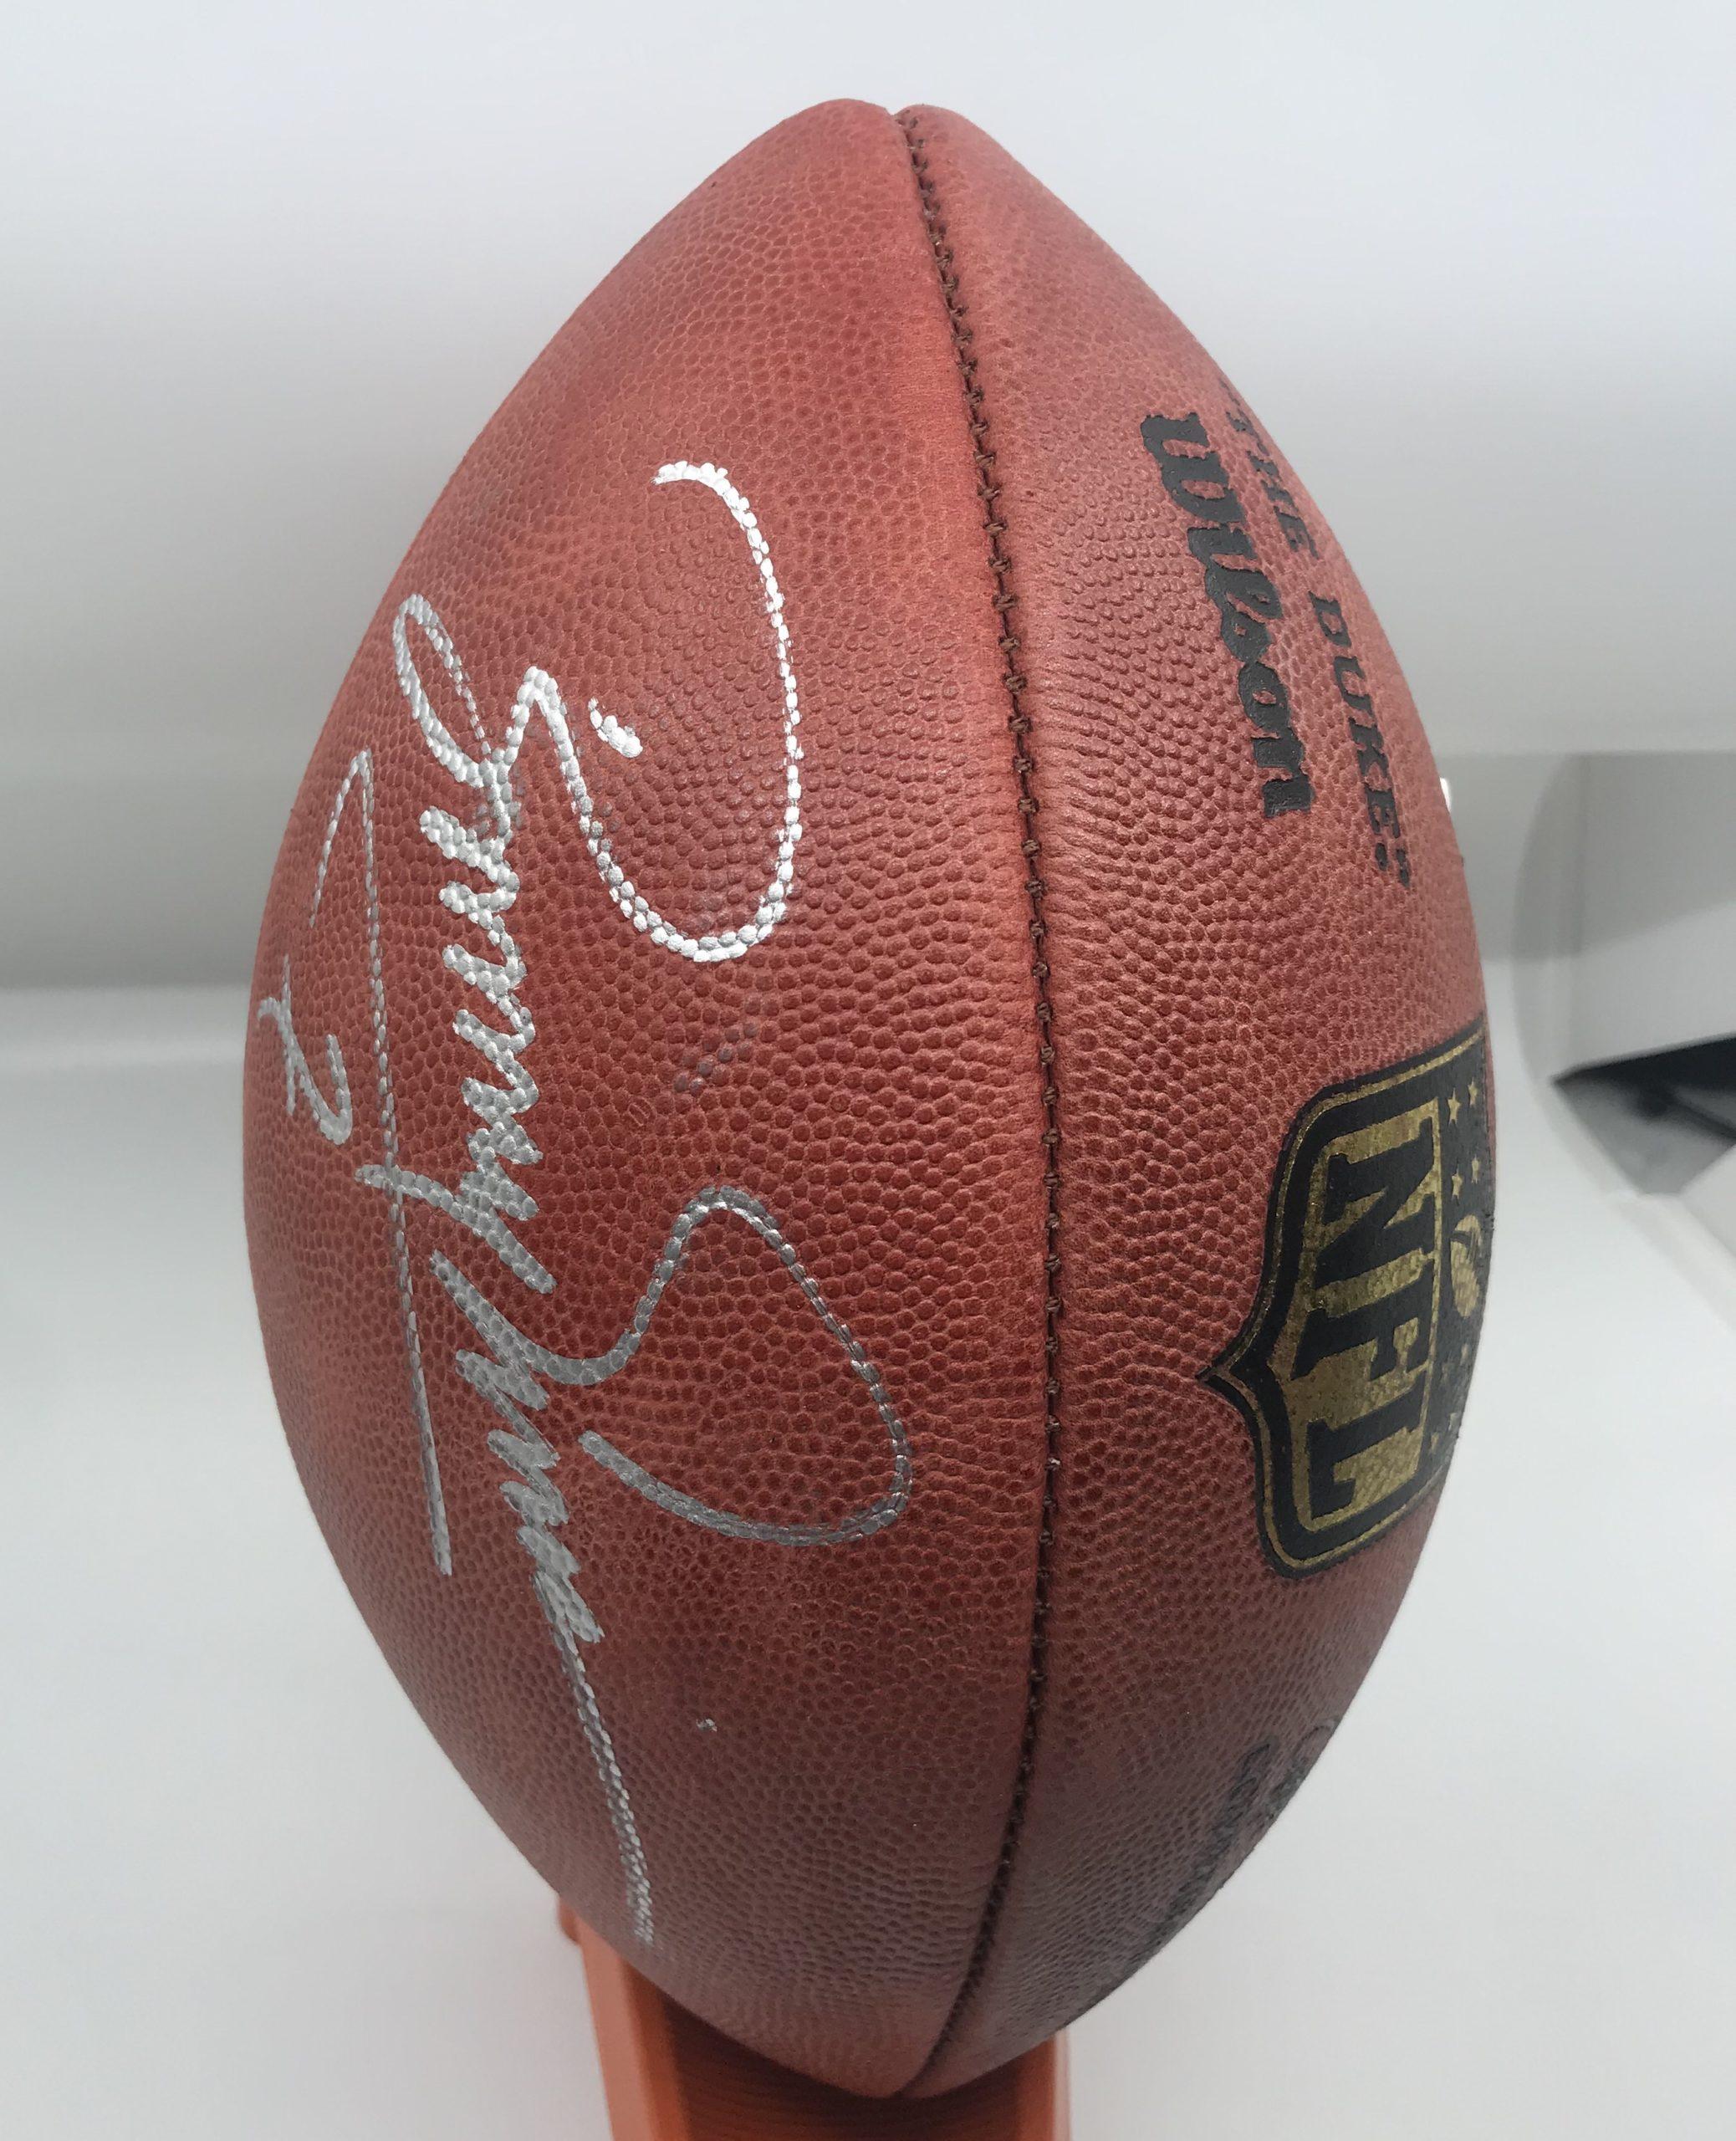 Boomer Esiason Autographed NFL Proline Football